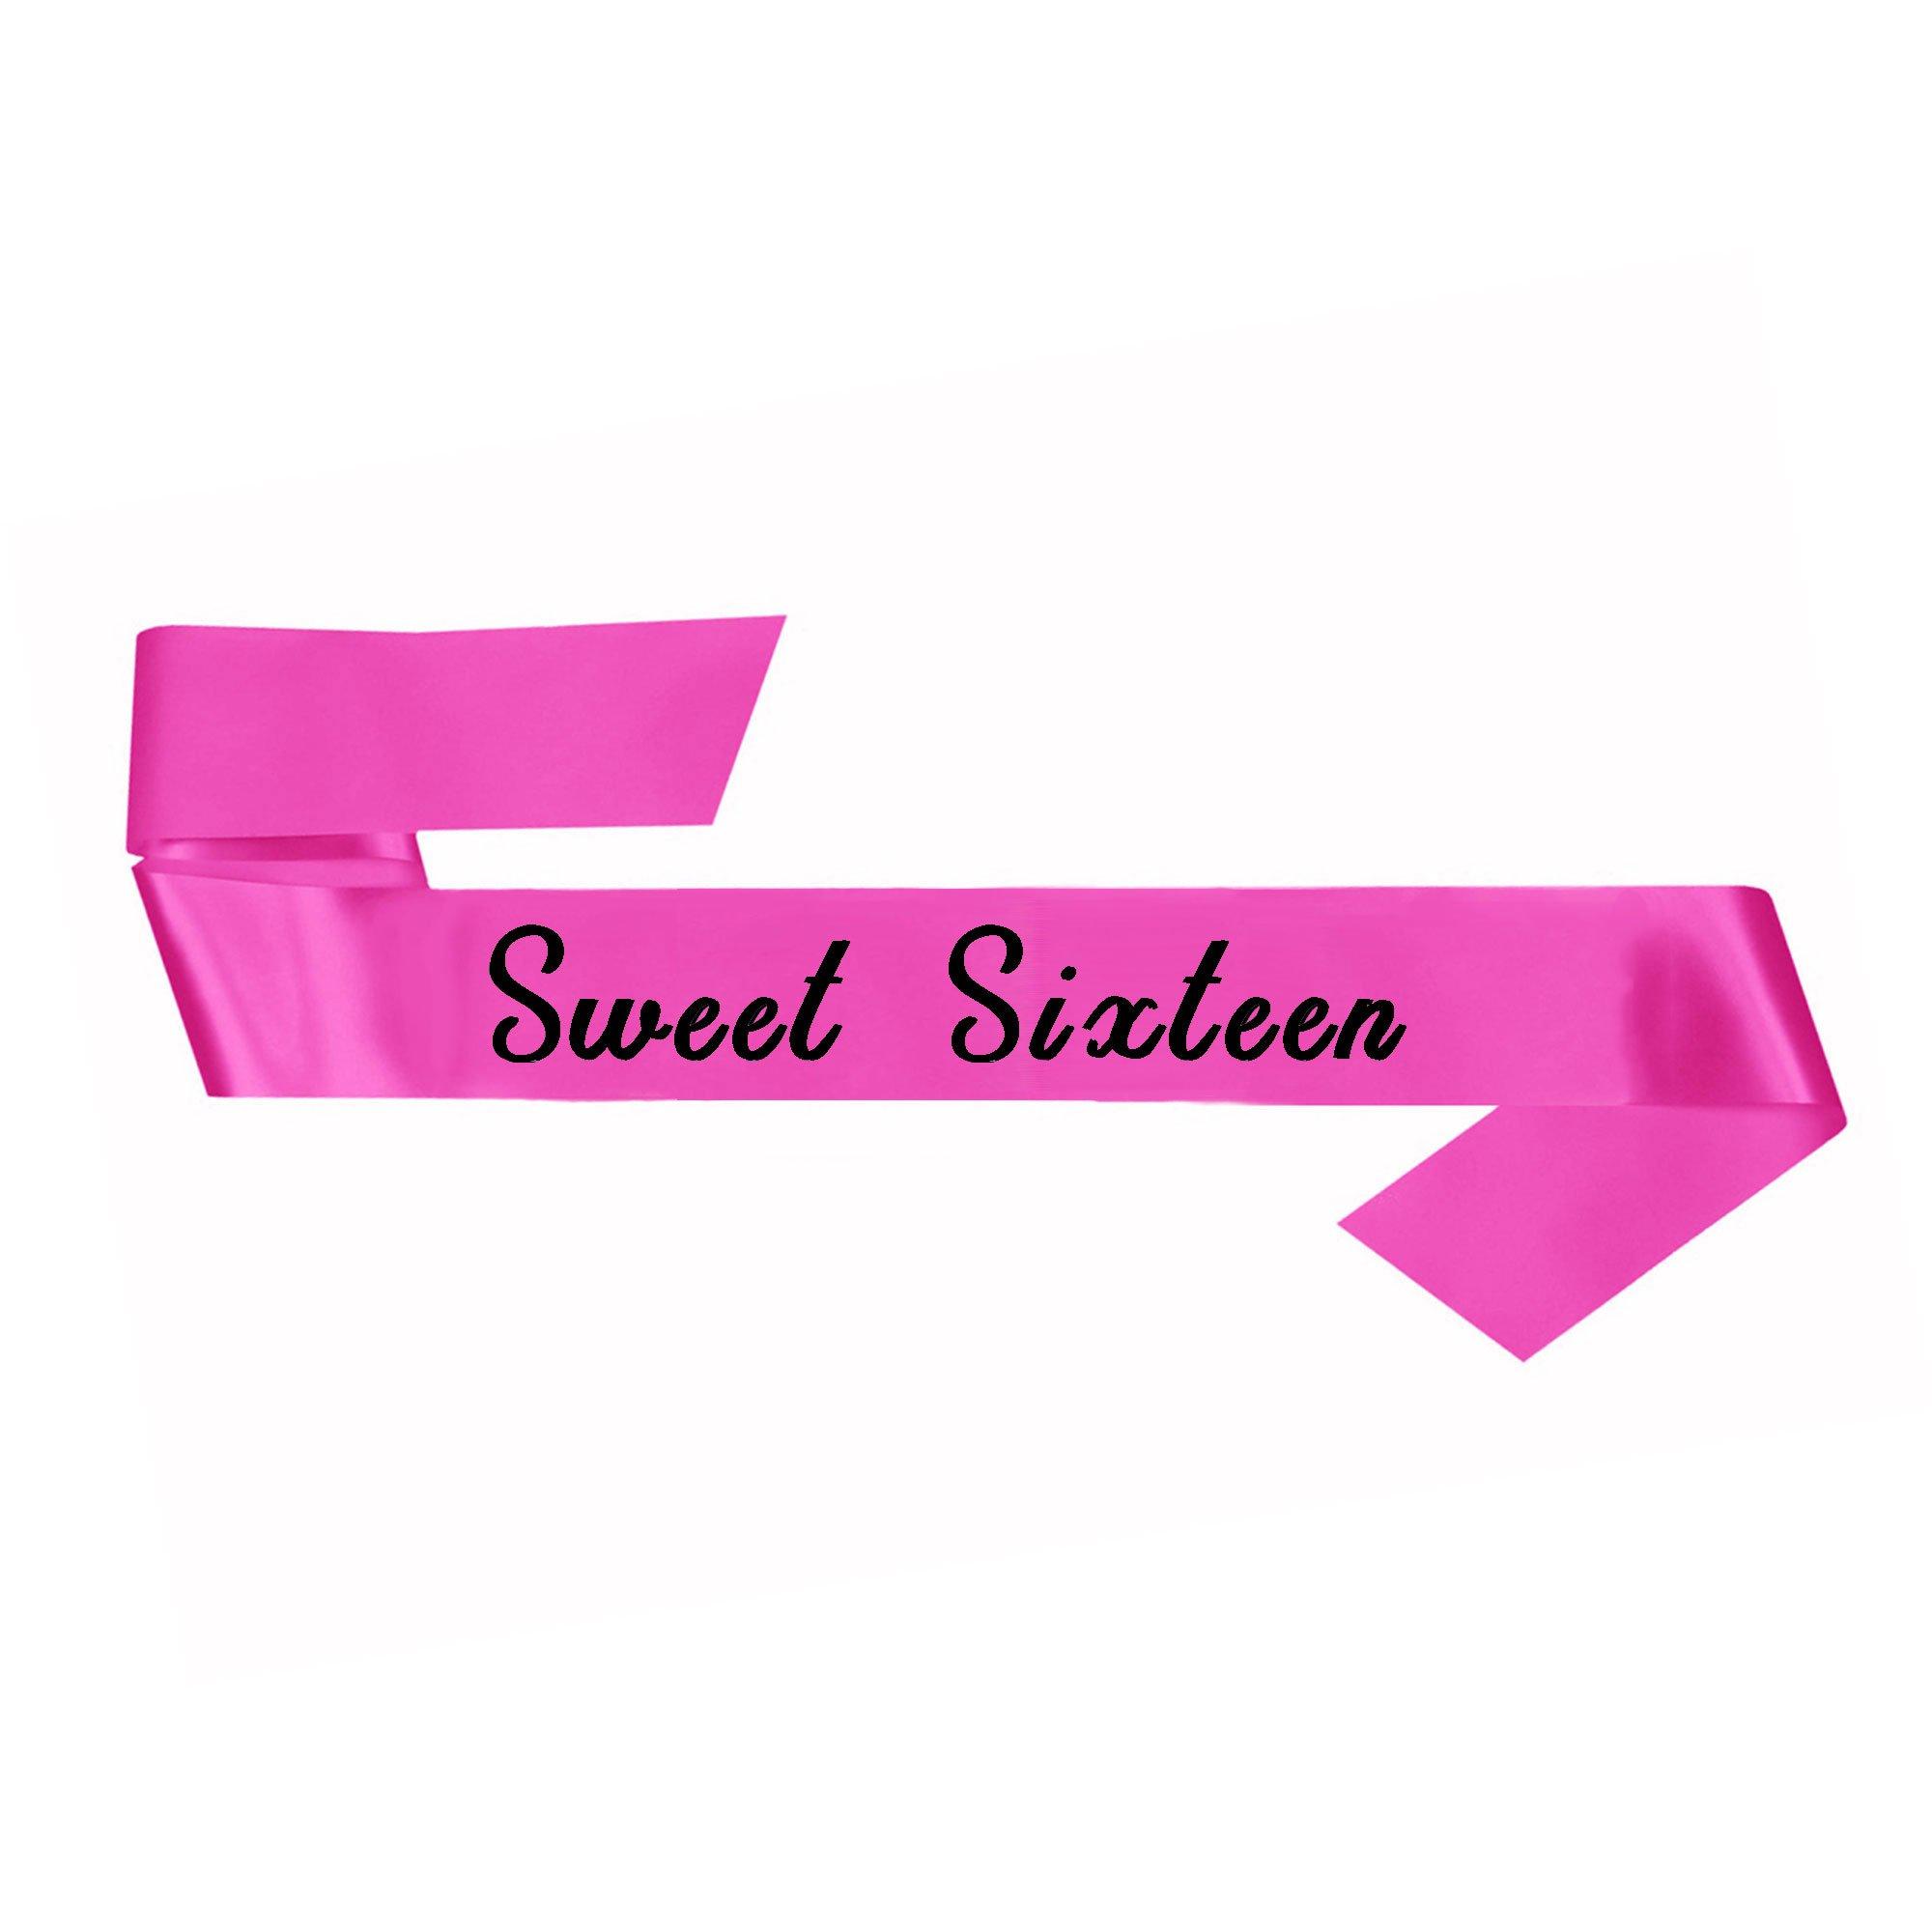 Sweet Sixteen Pink Fabric Sash